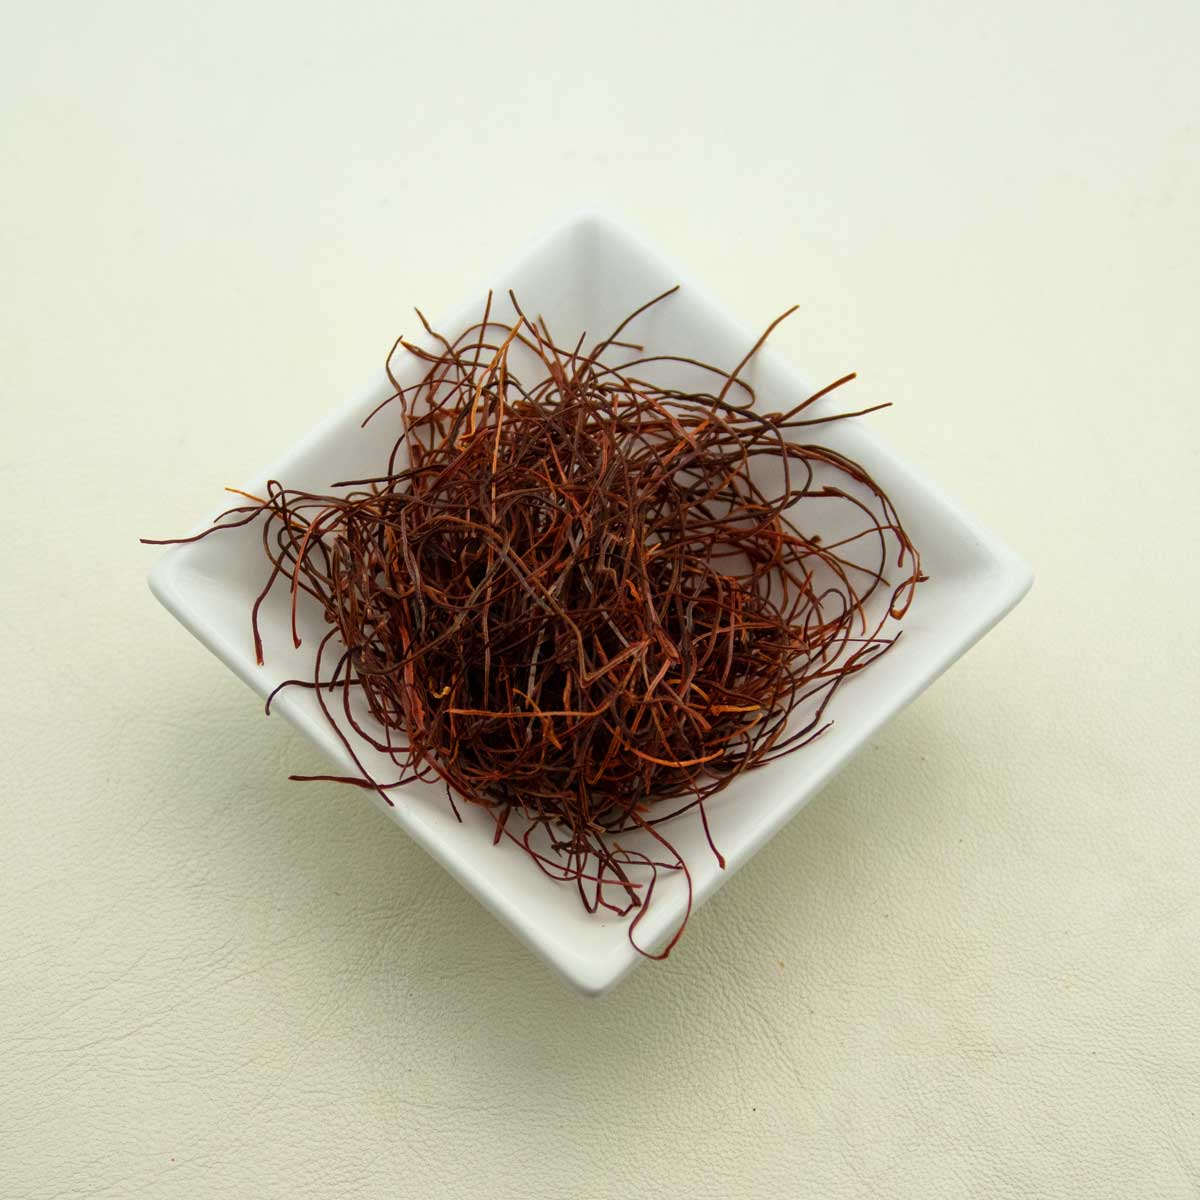 Chili Fäden 15g